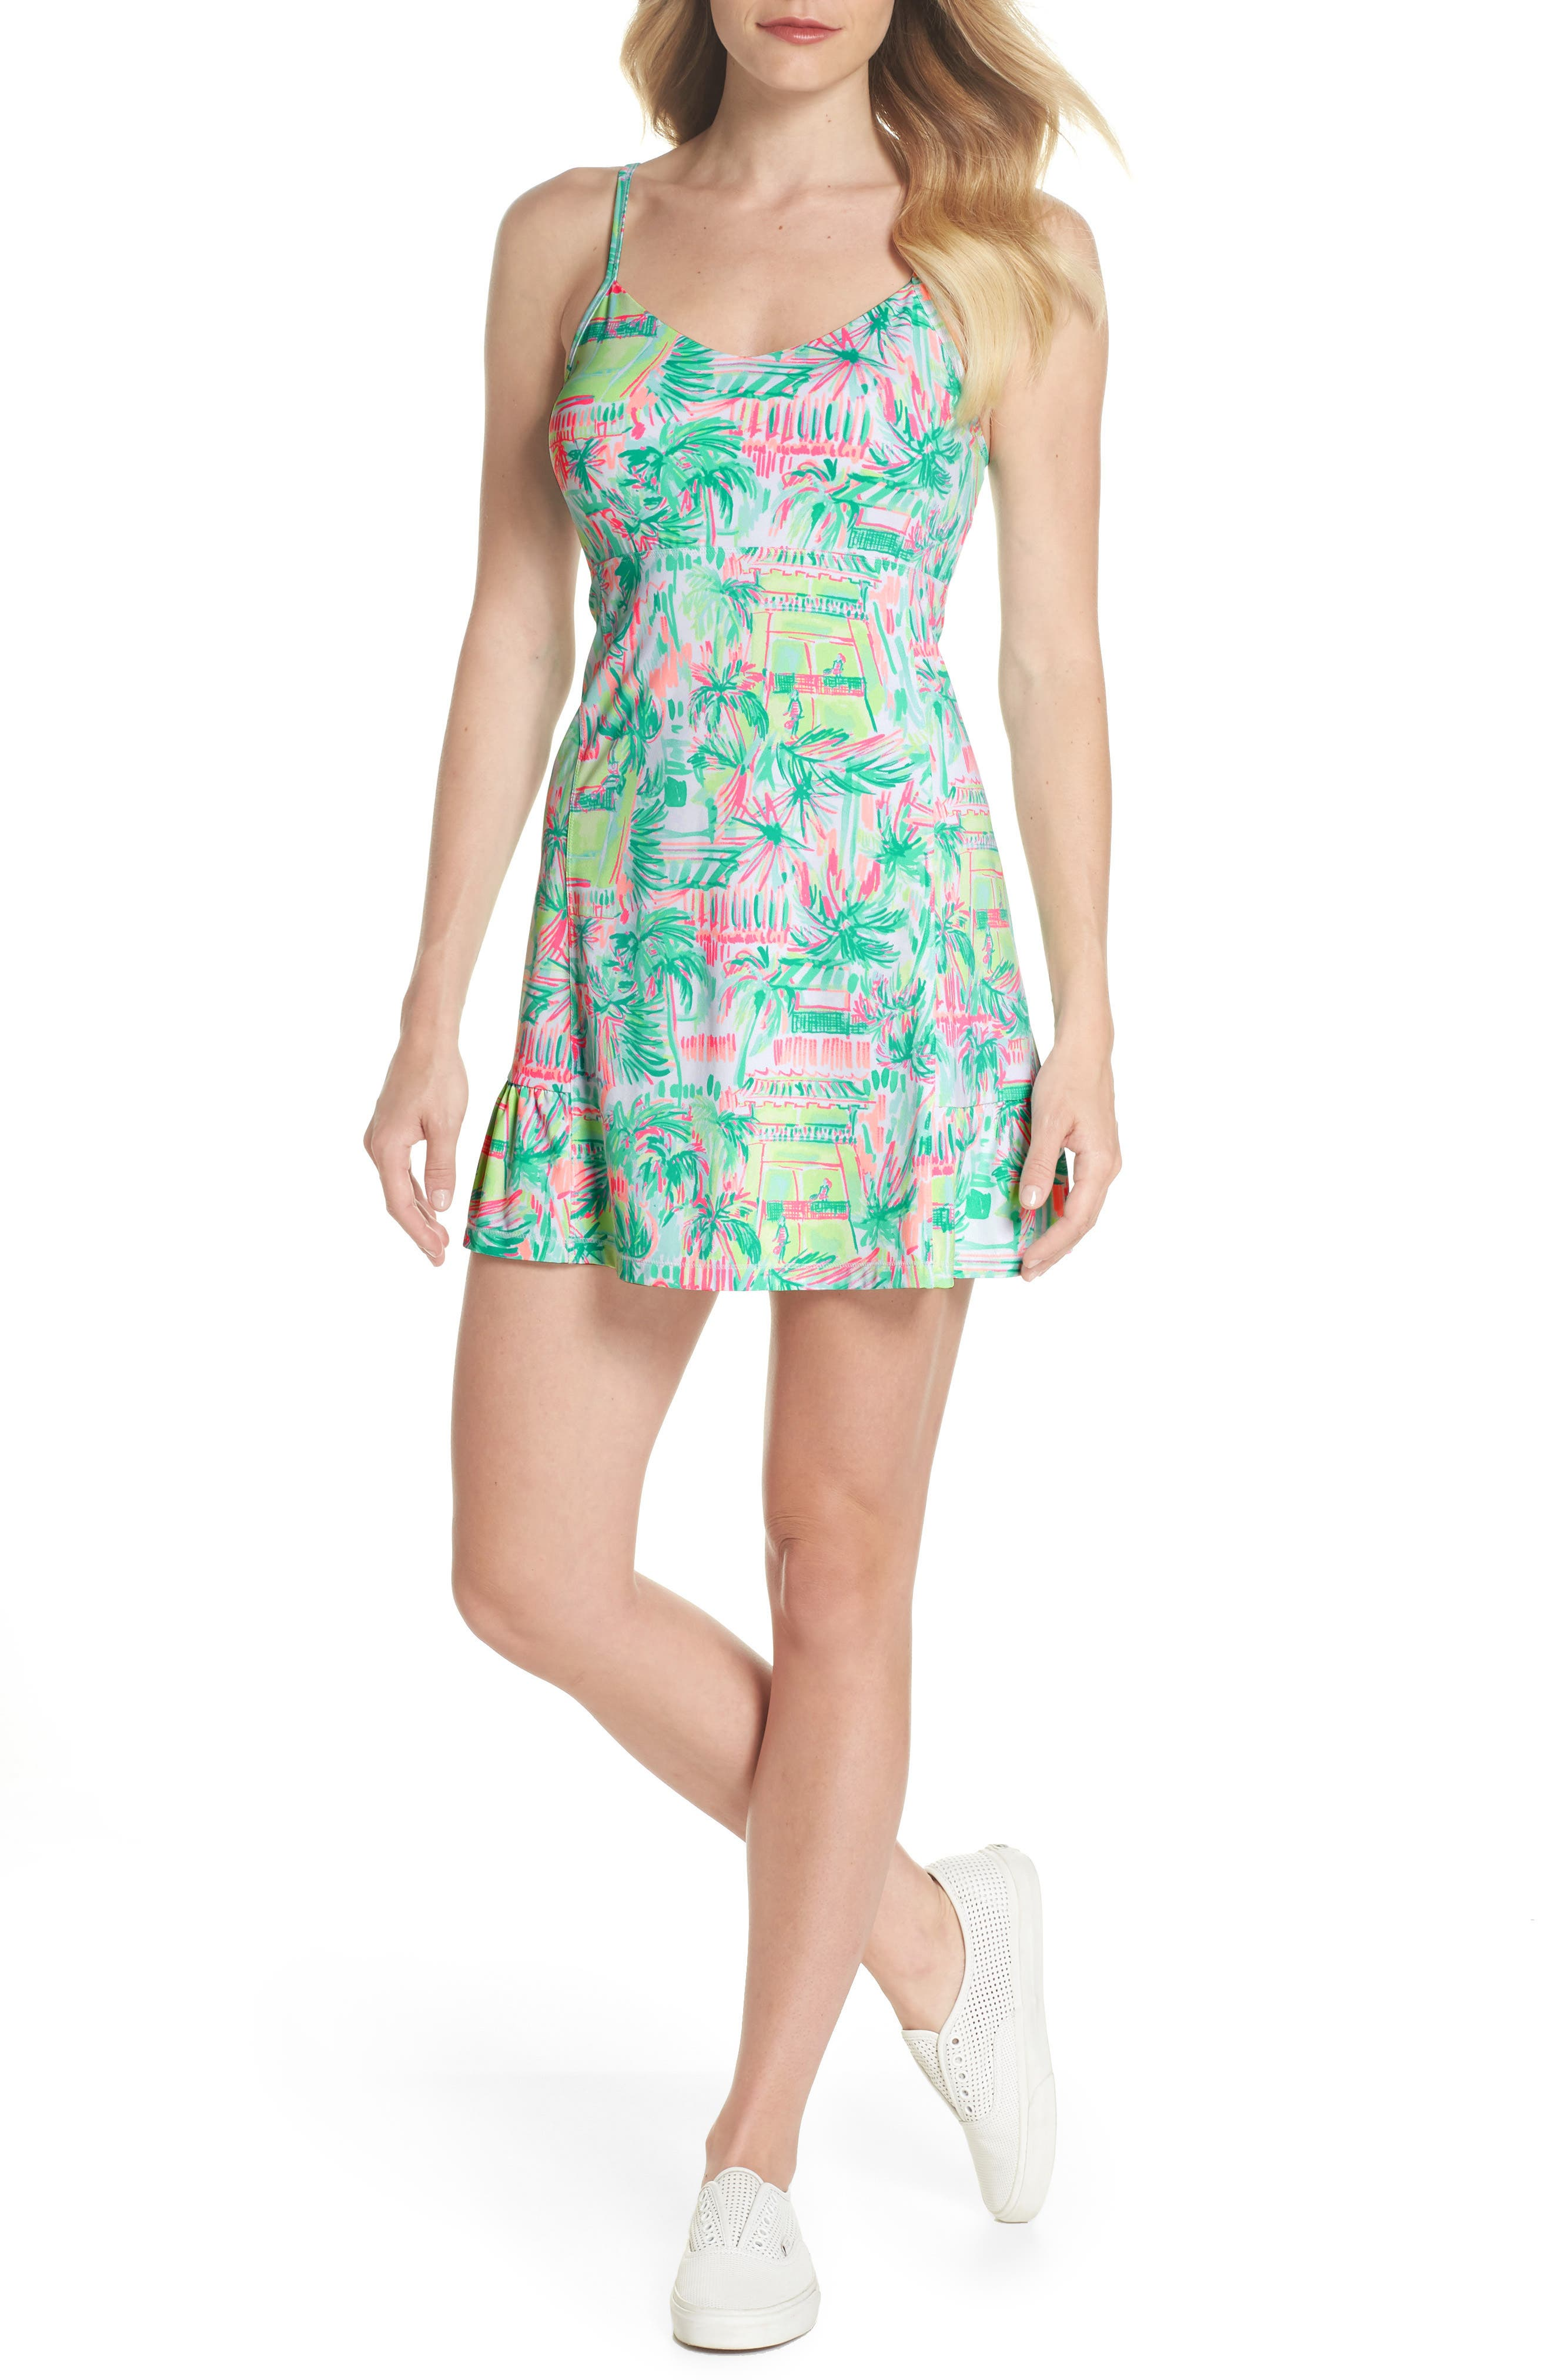 Adelia UPF 50+ Tennis Dress,                         Main,                         color, MULTI PERFECT MATCH